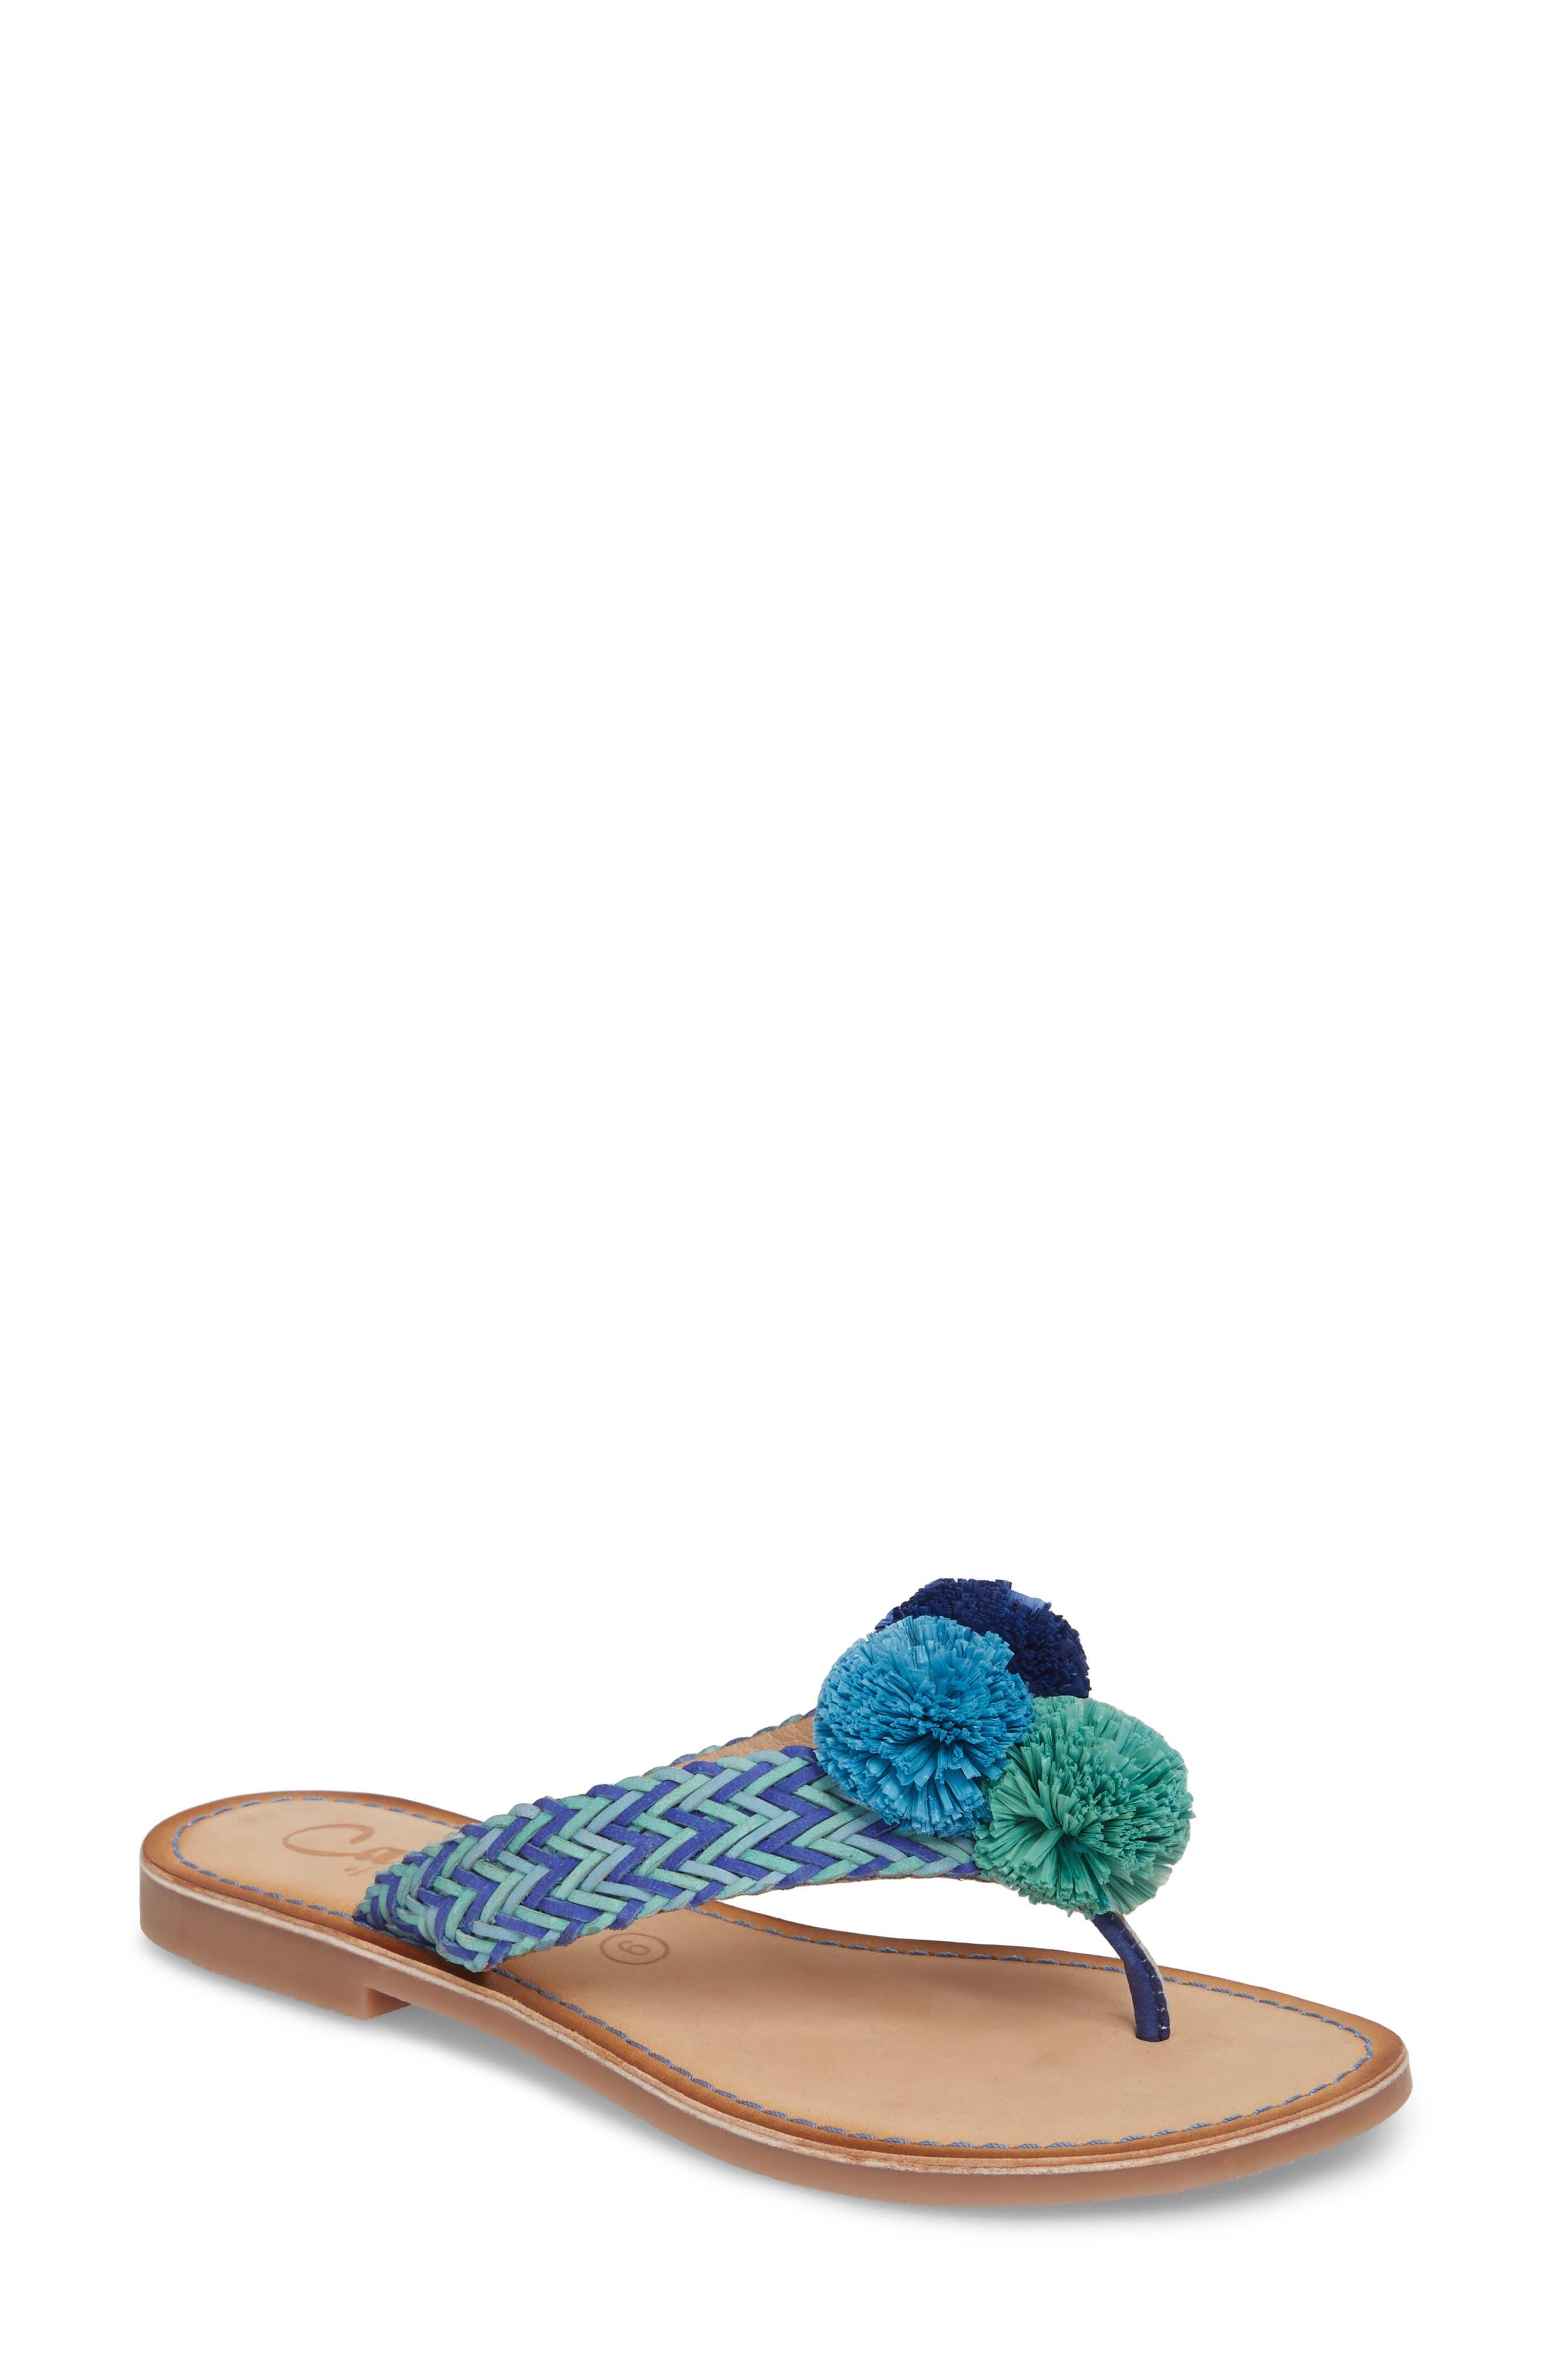 Pomm Flip Flop,                         Main,                         color, 429